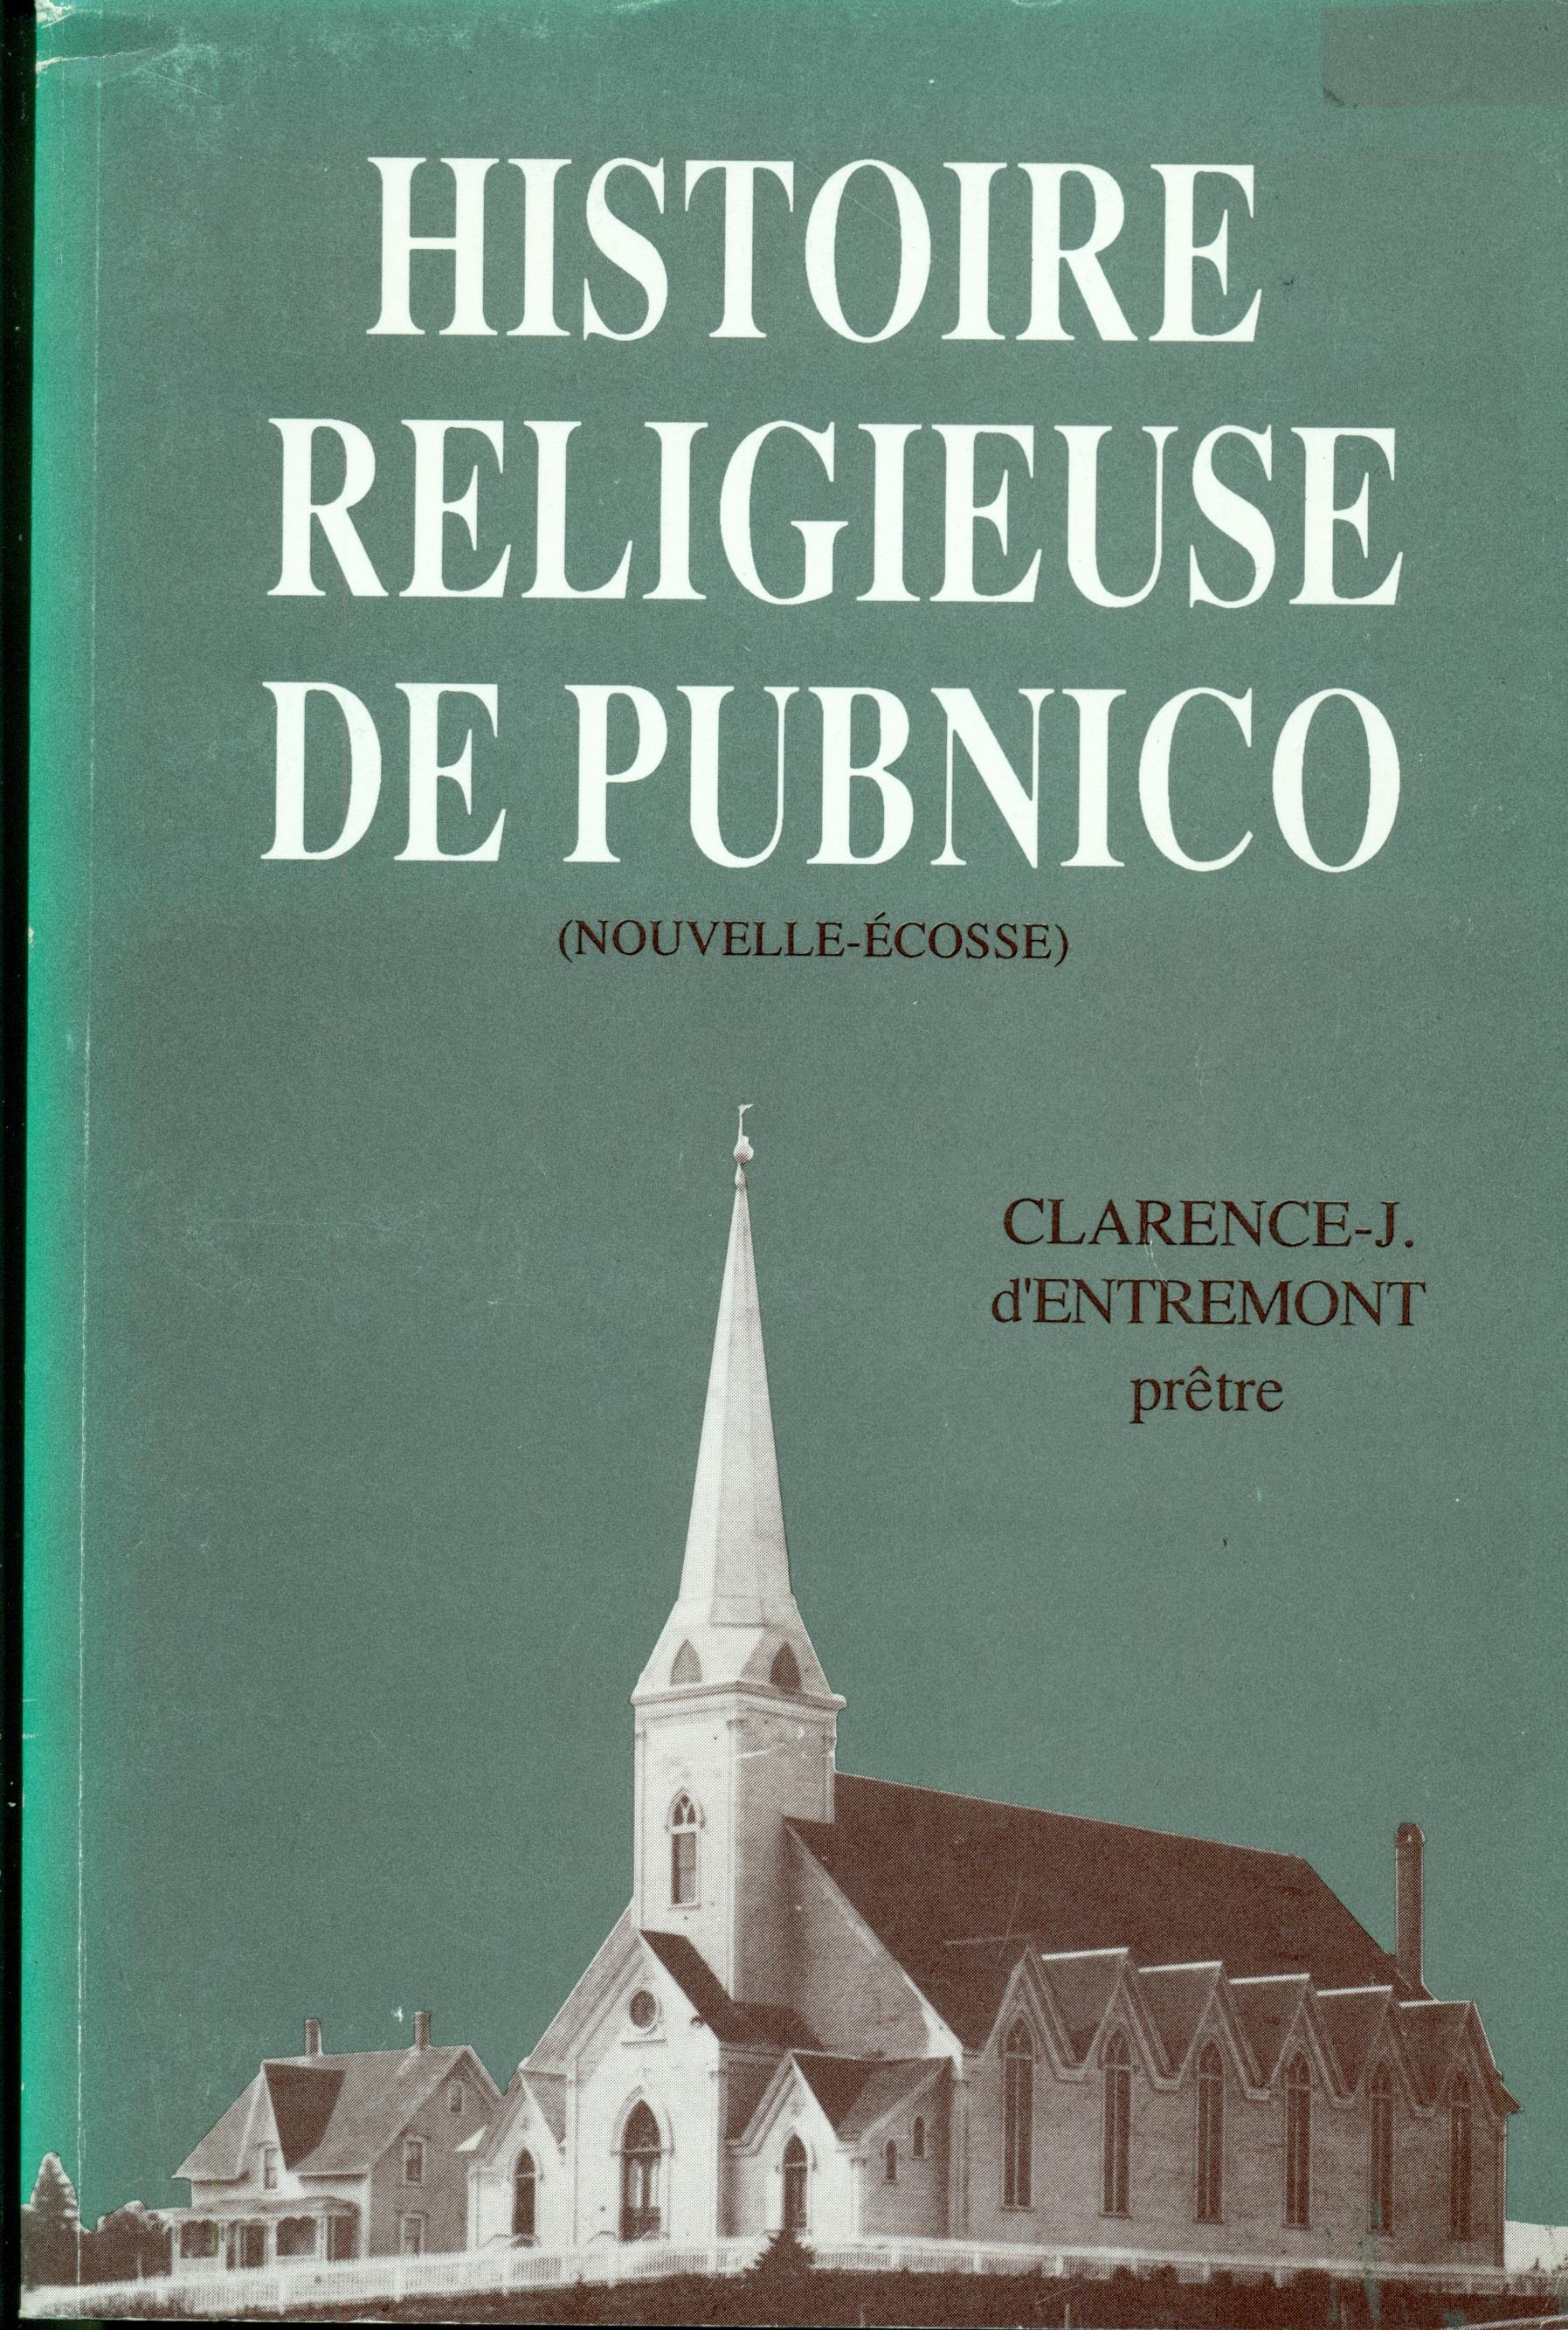 Histoire Religieuse de Pubnico